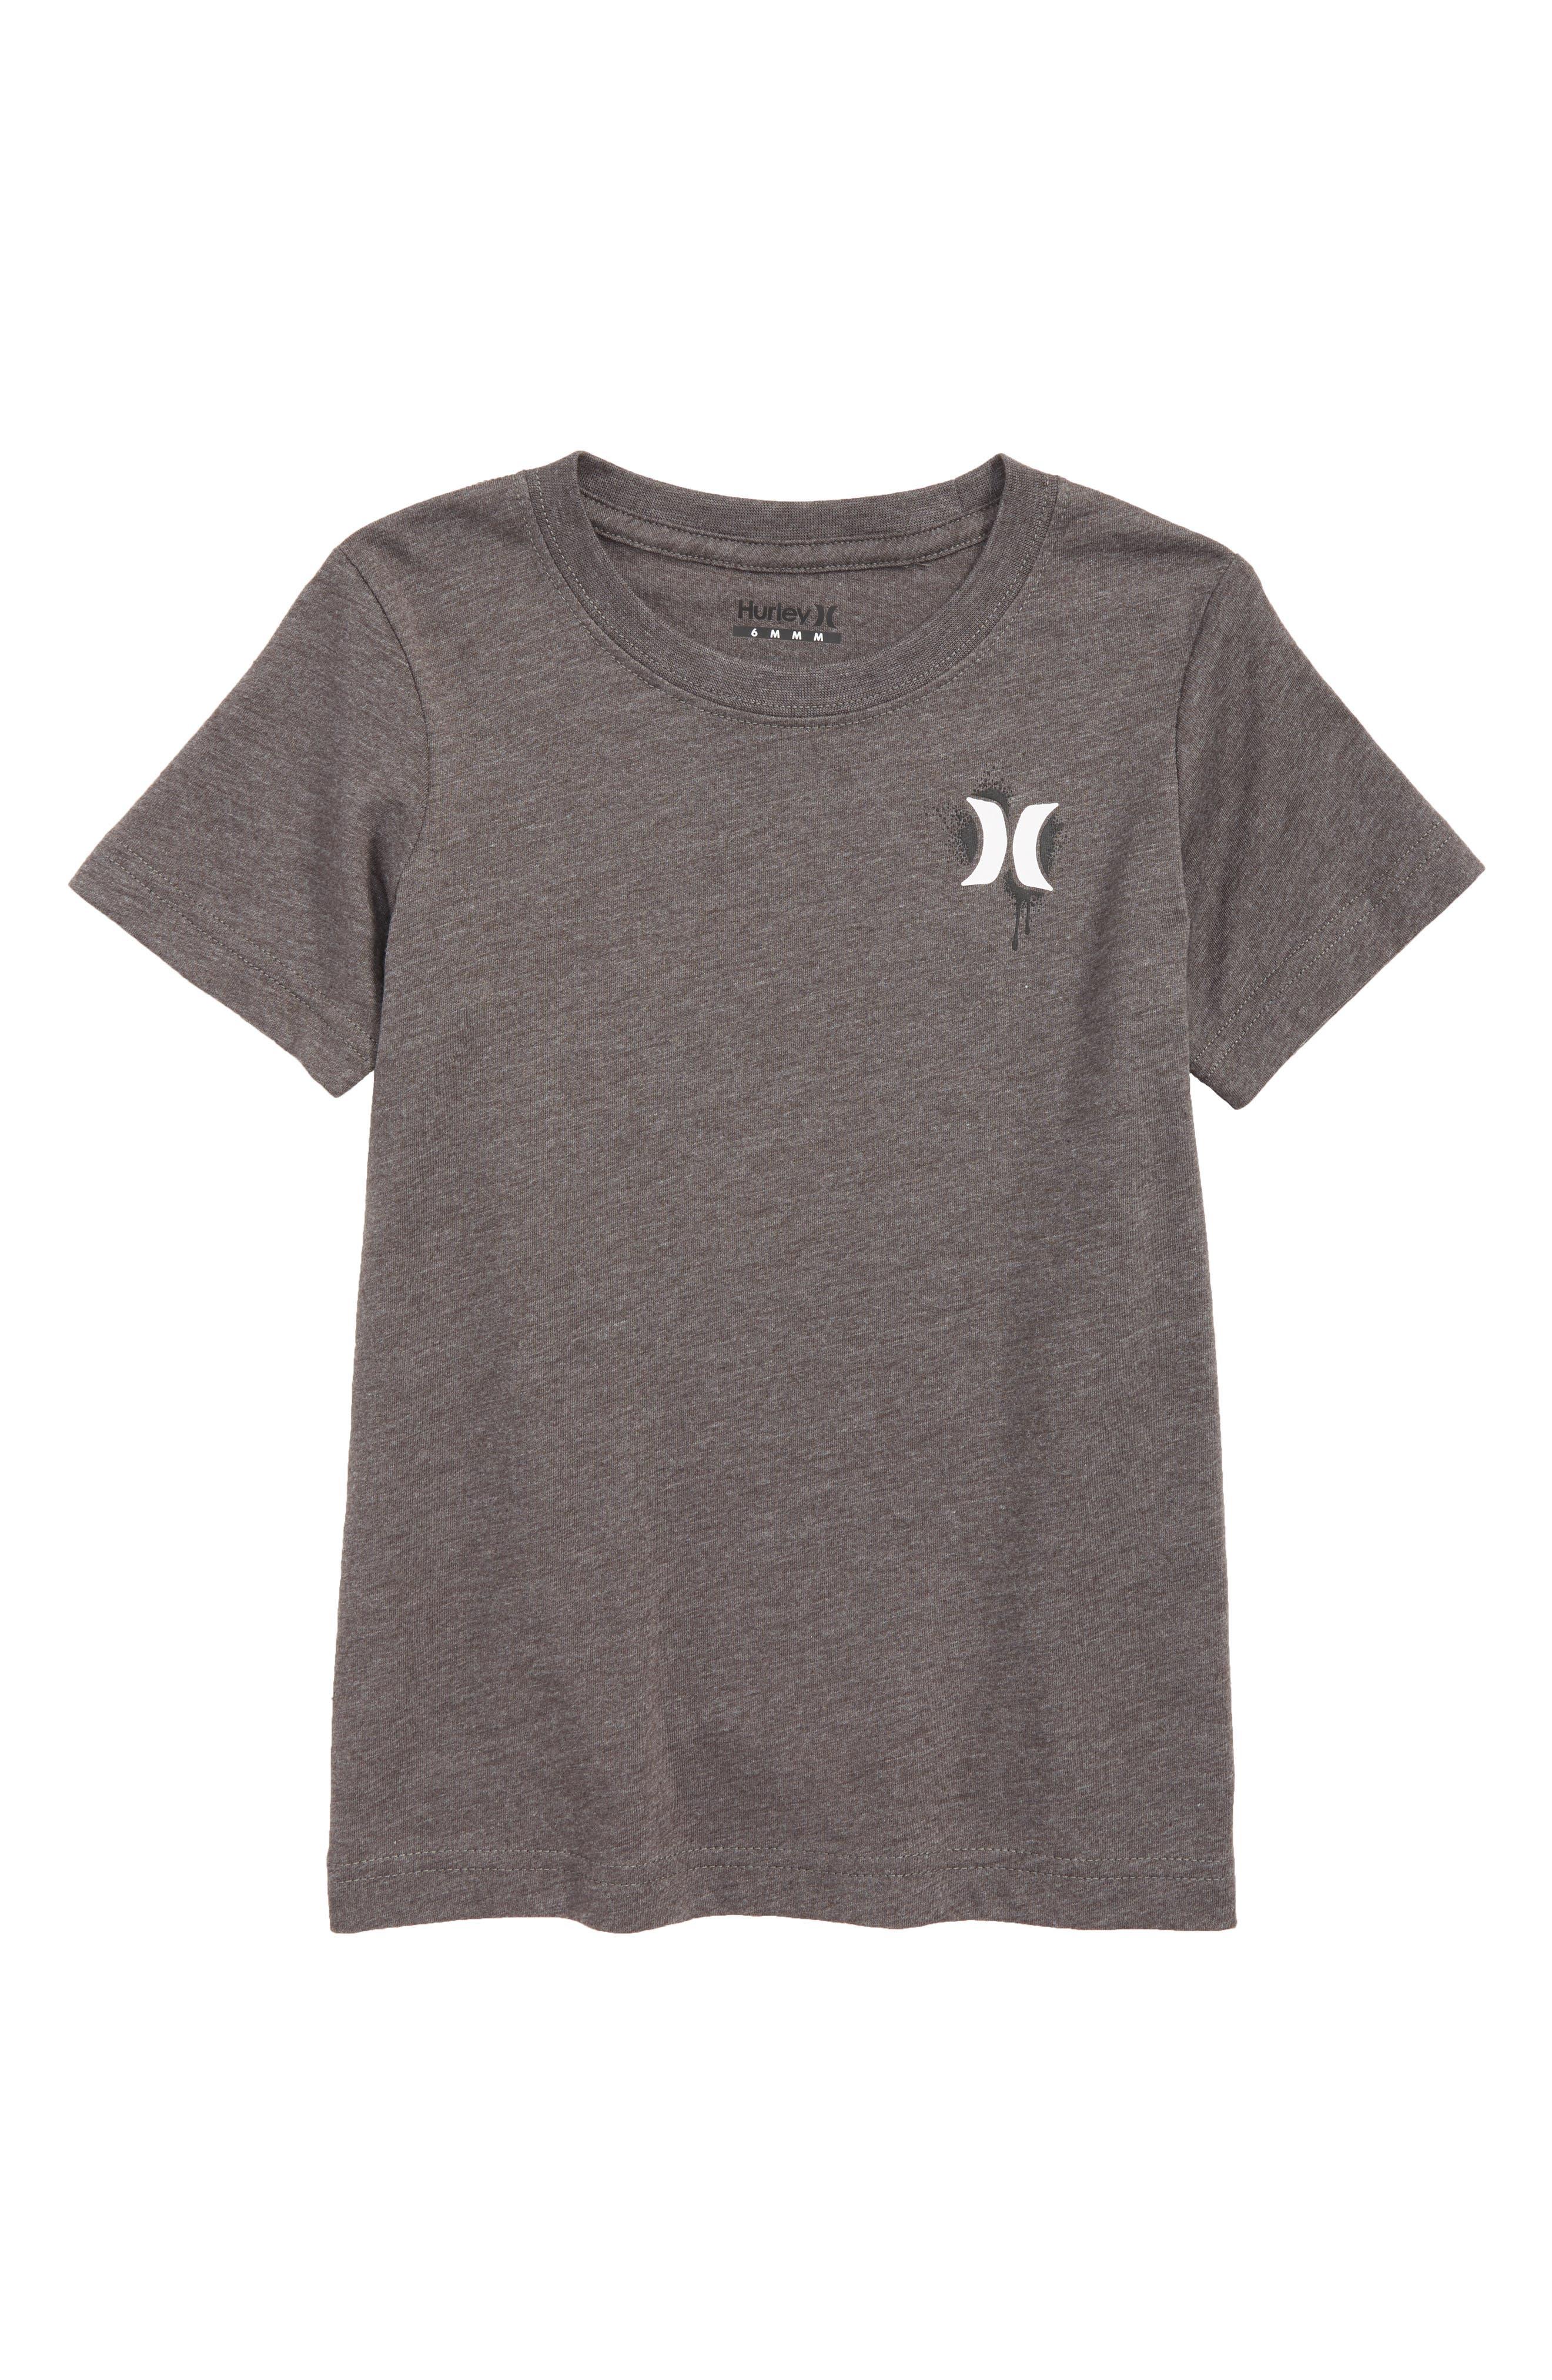 Shark T-Shirt,                         Main,                         color, CHARCOAL HEATHER